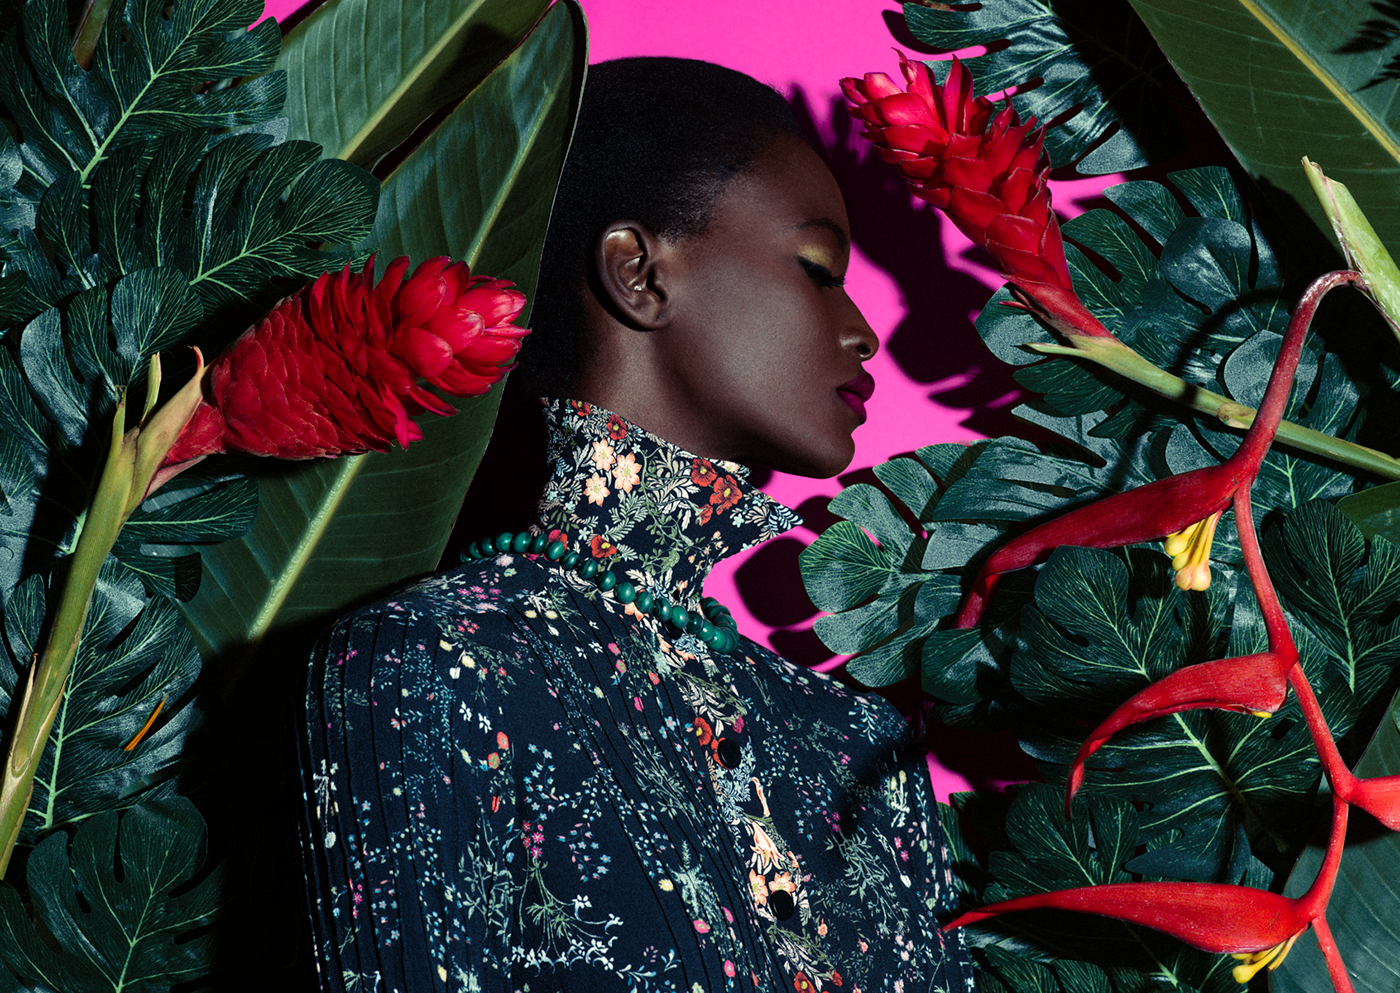 Jardin Fluo / фото Elena Iv-skaya модель Oulimata Gallet